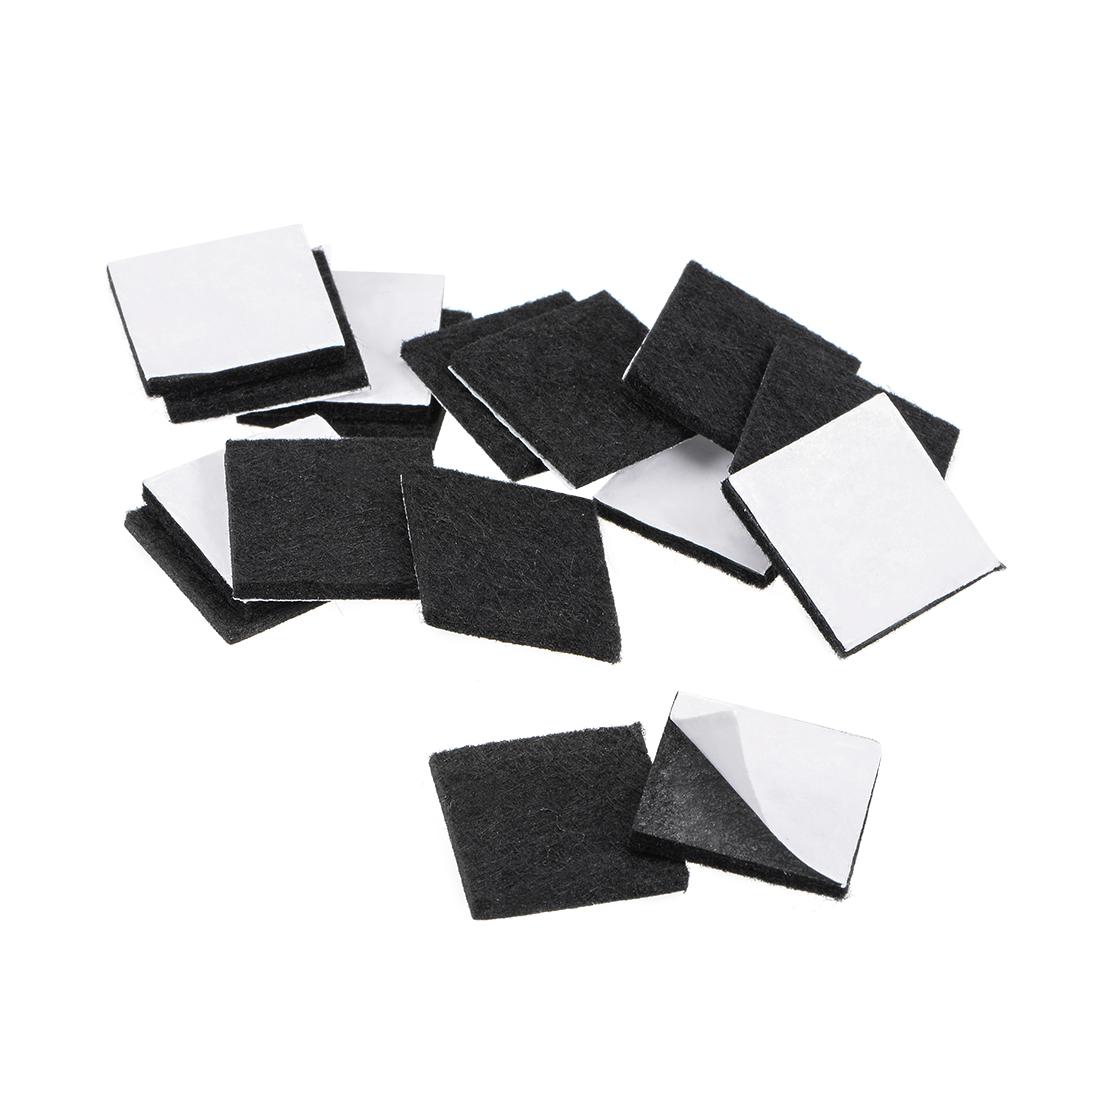 Furniture Pads Adhesive Felt Pads 25mm x 25mm Square 3mm Thick Black 36Pcs